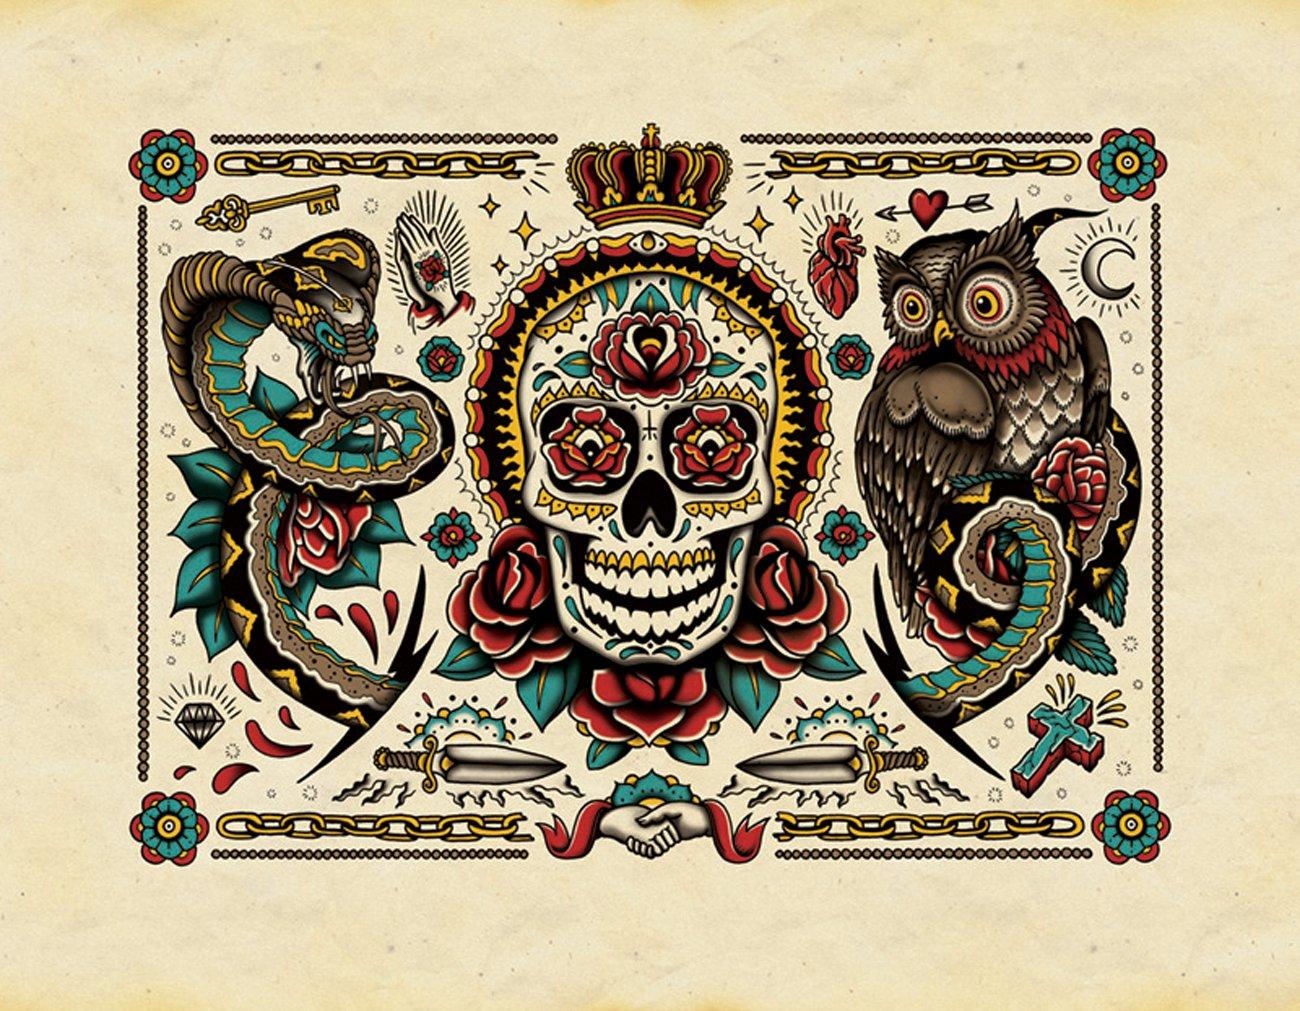 The Tattoo Colouring Book: Amazon.co.uk: Megamunden: 9781780670126 ...